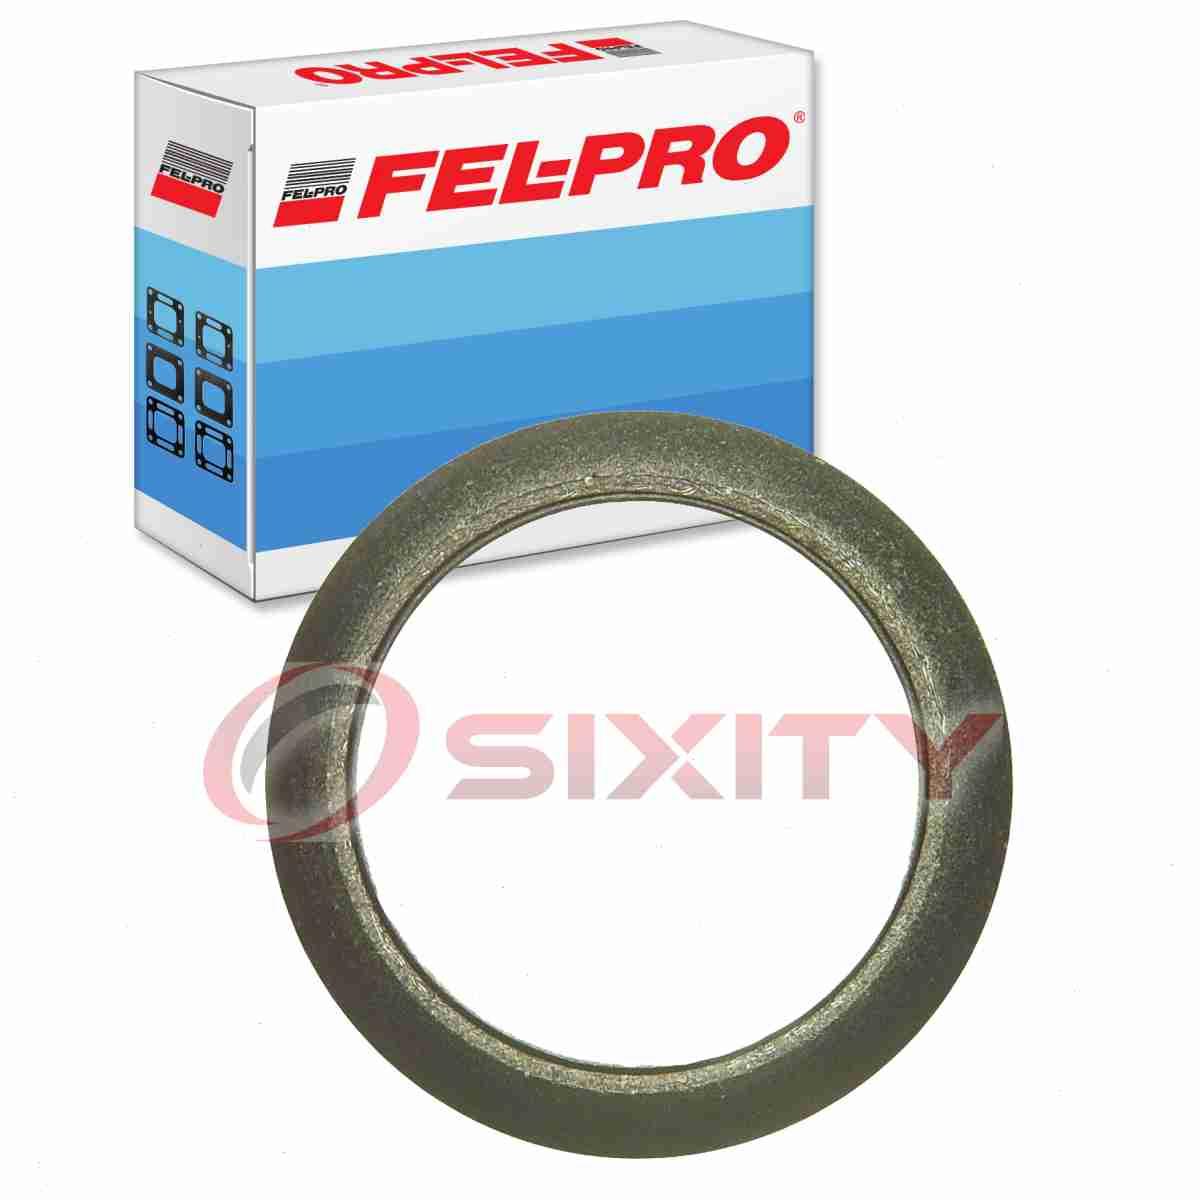 Fel-Pro Exhaust Pipe Flange Gasket for 1996-2000 GMC K3500 FelPro Sealing lc